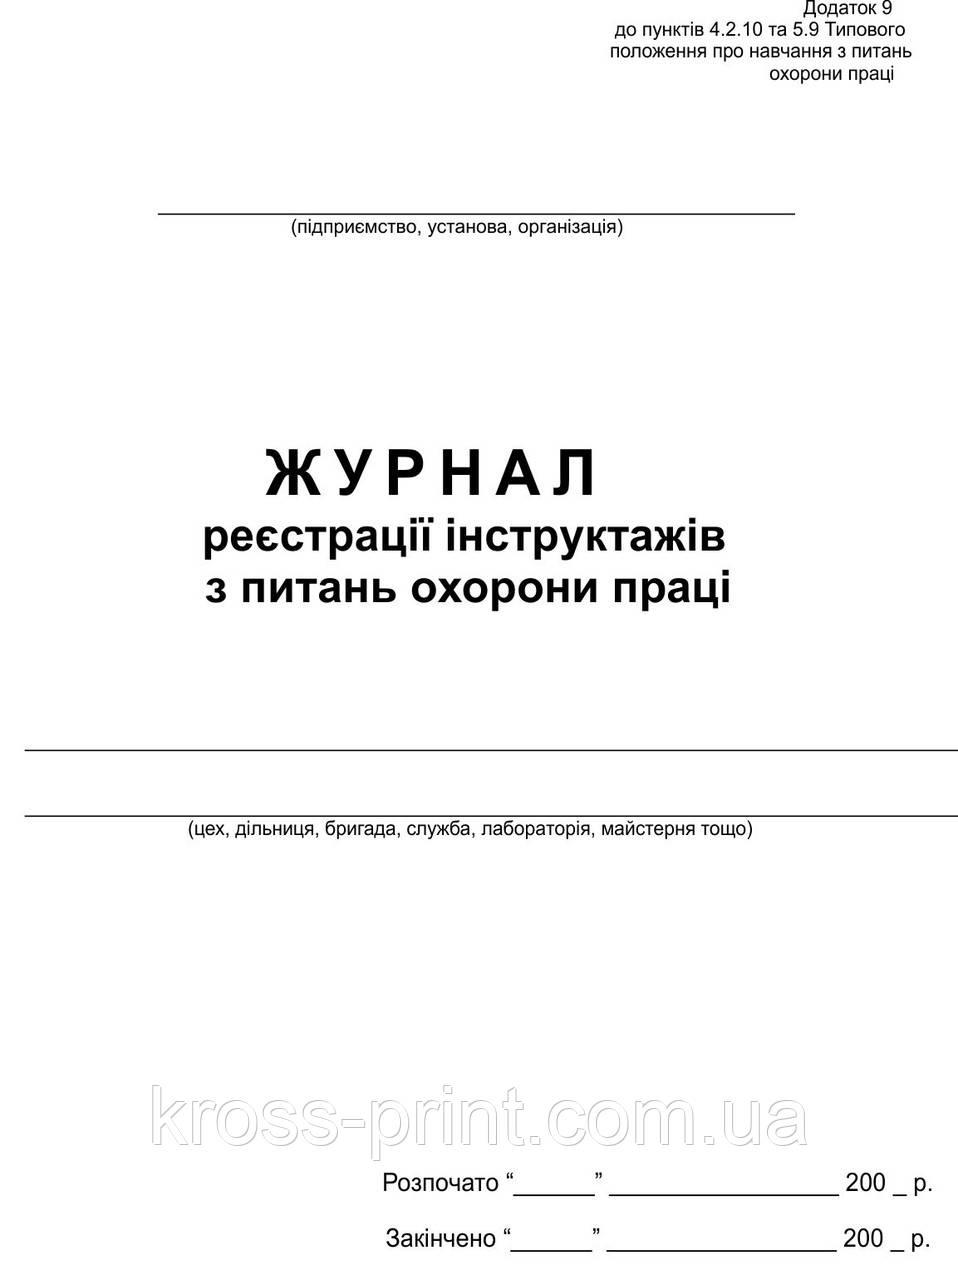 Журнал инструктажей по охране труда А4 50л офс. Дод.9